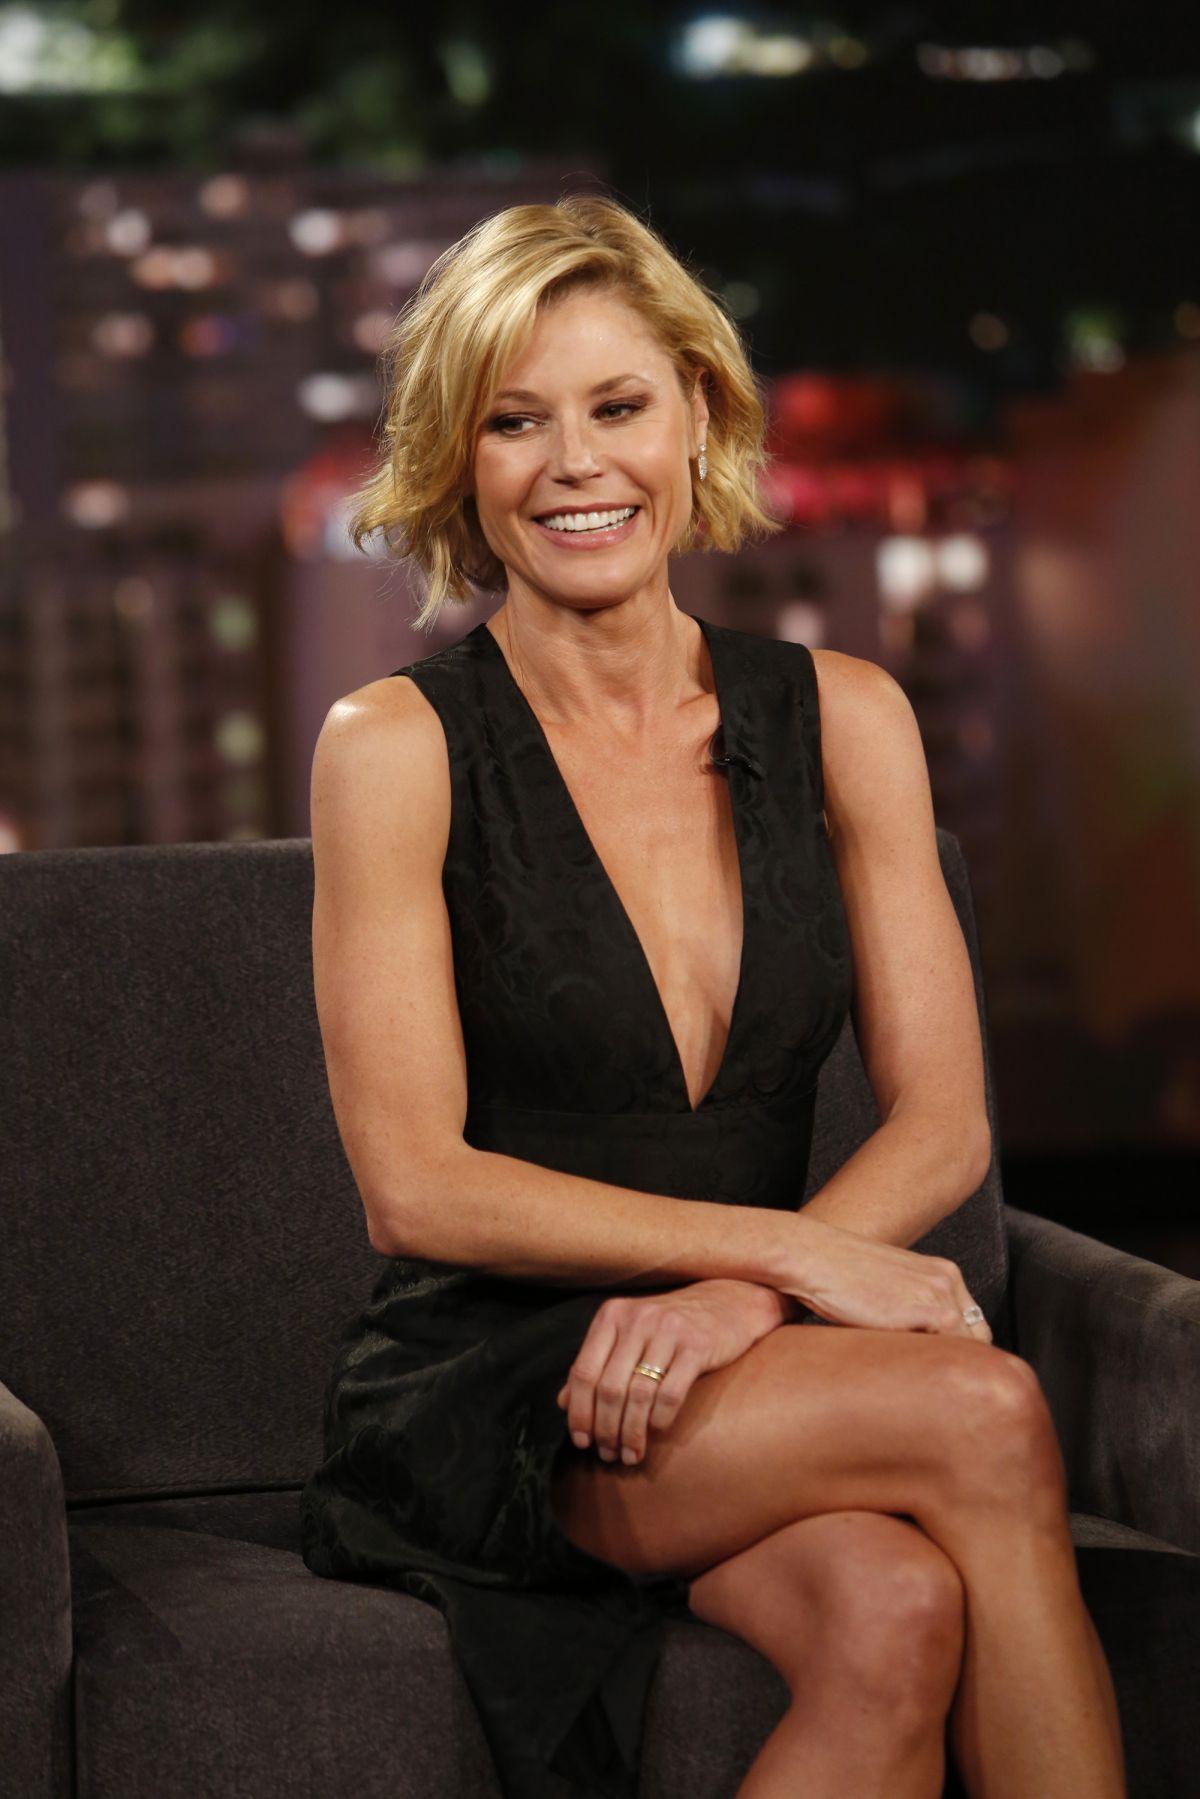 JULIE BOWEN at Jimmy Kimmel Live in Hollywood 05/04/2016